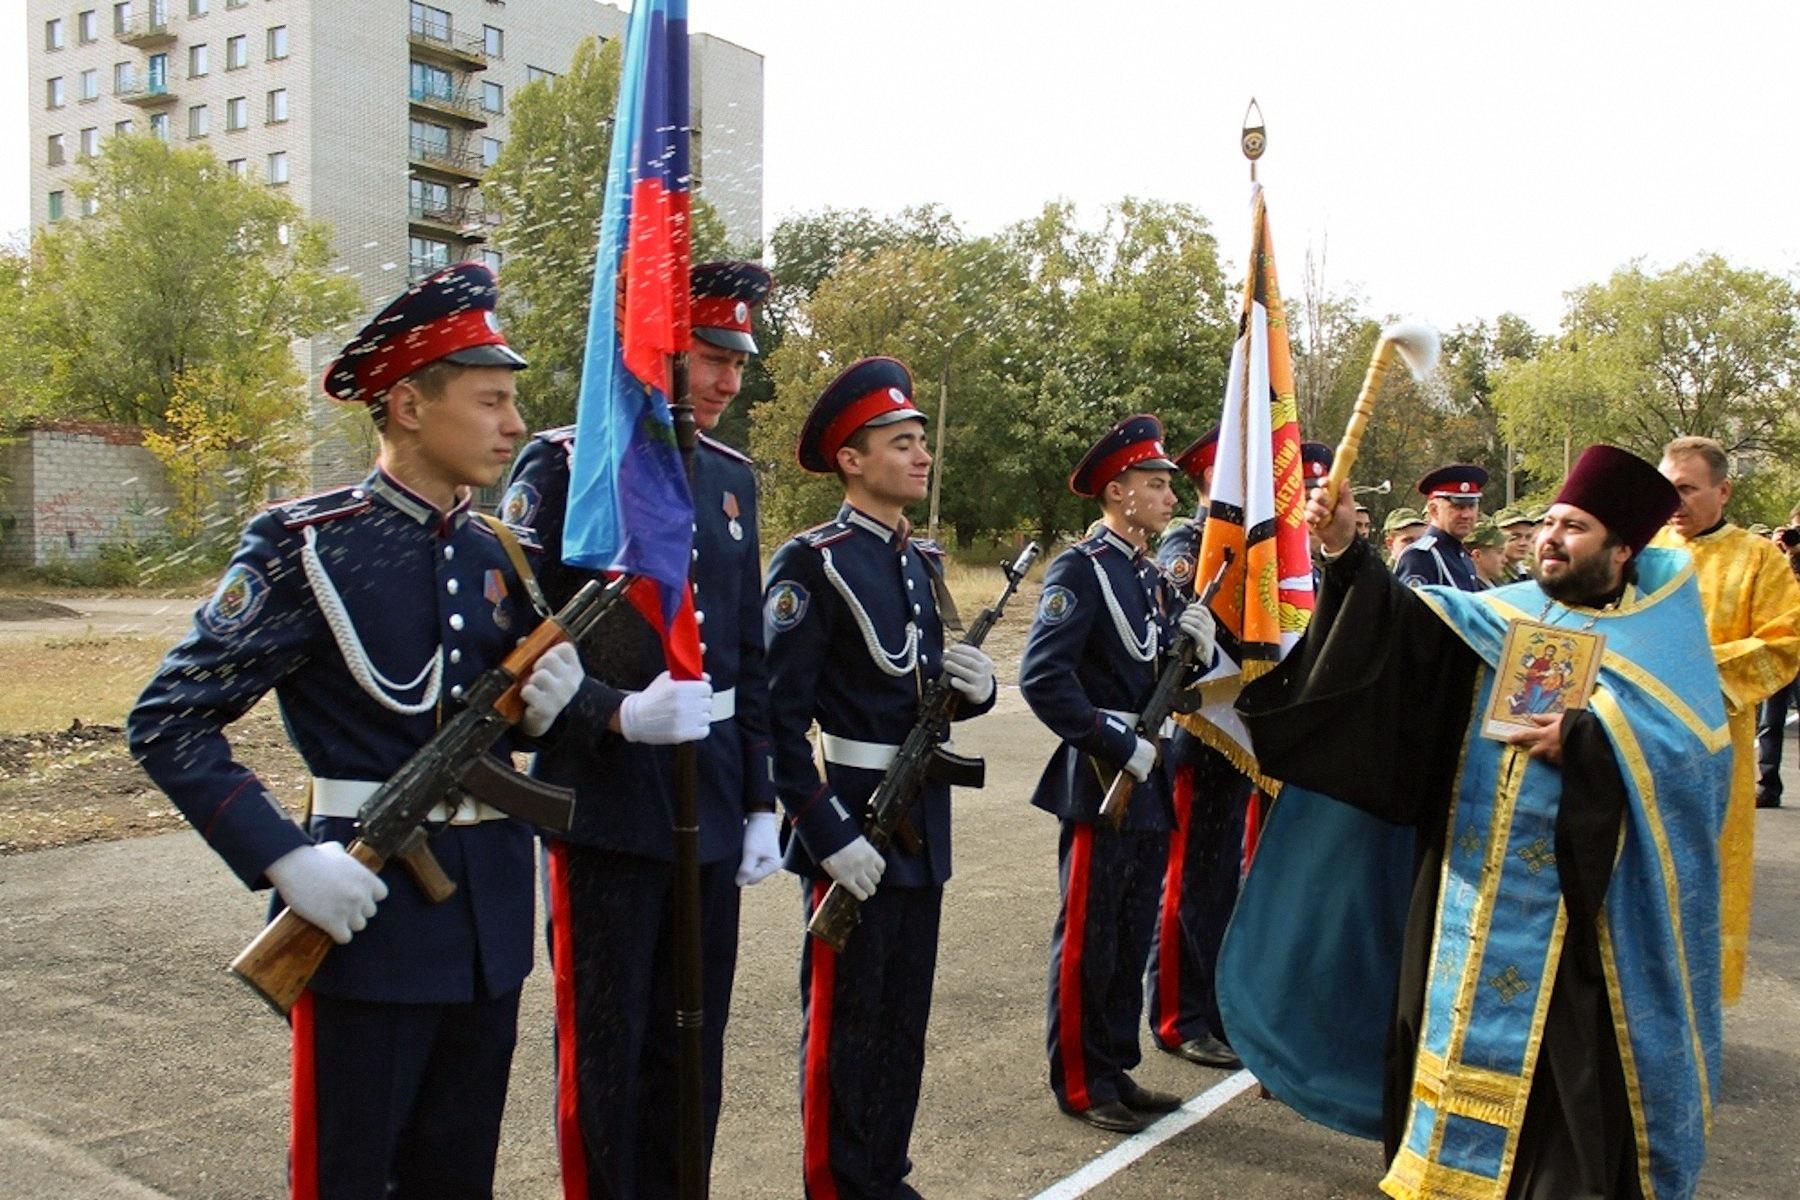 00 lugansk pr lnr cossack cadet corps 03 191015